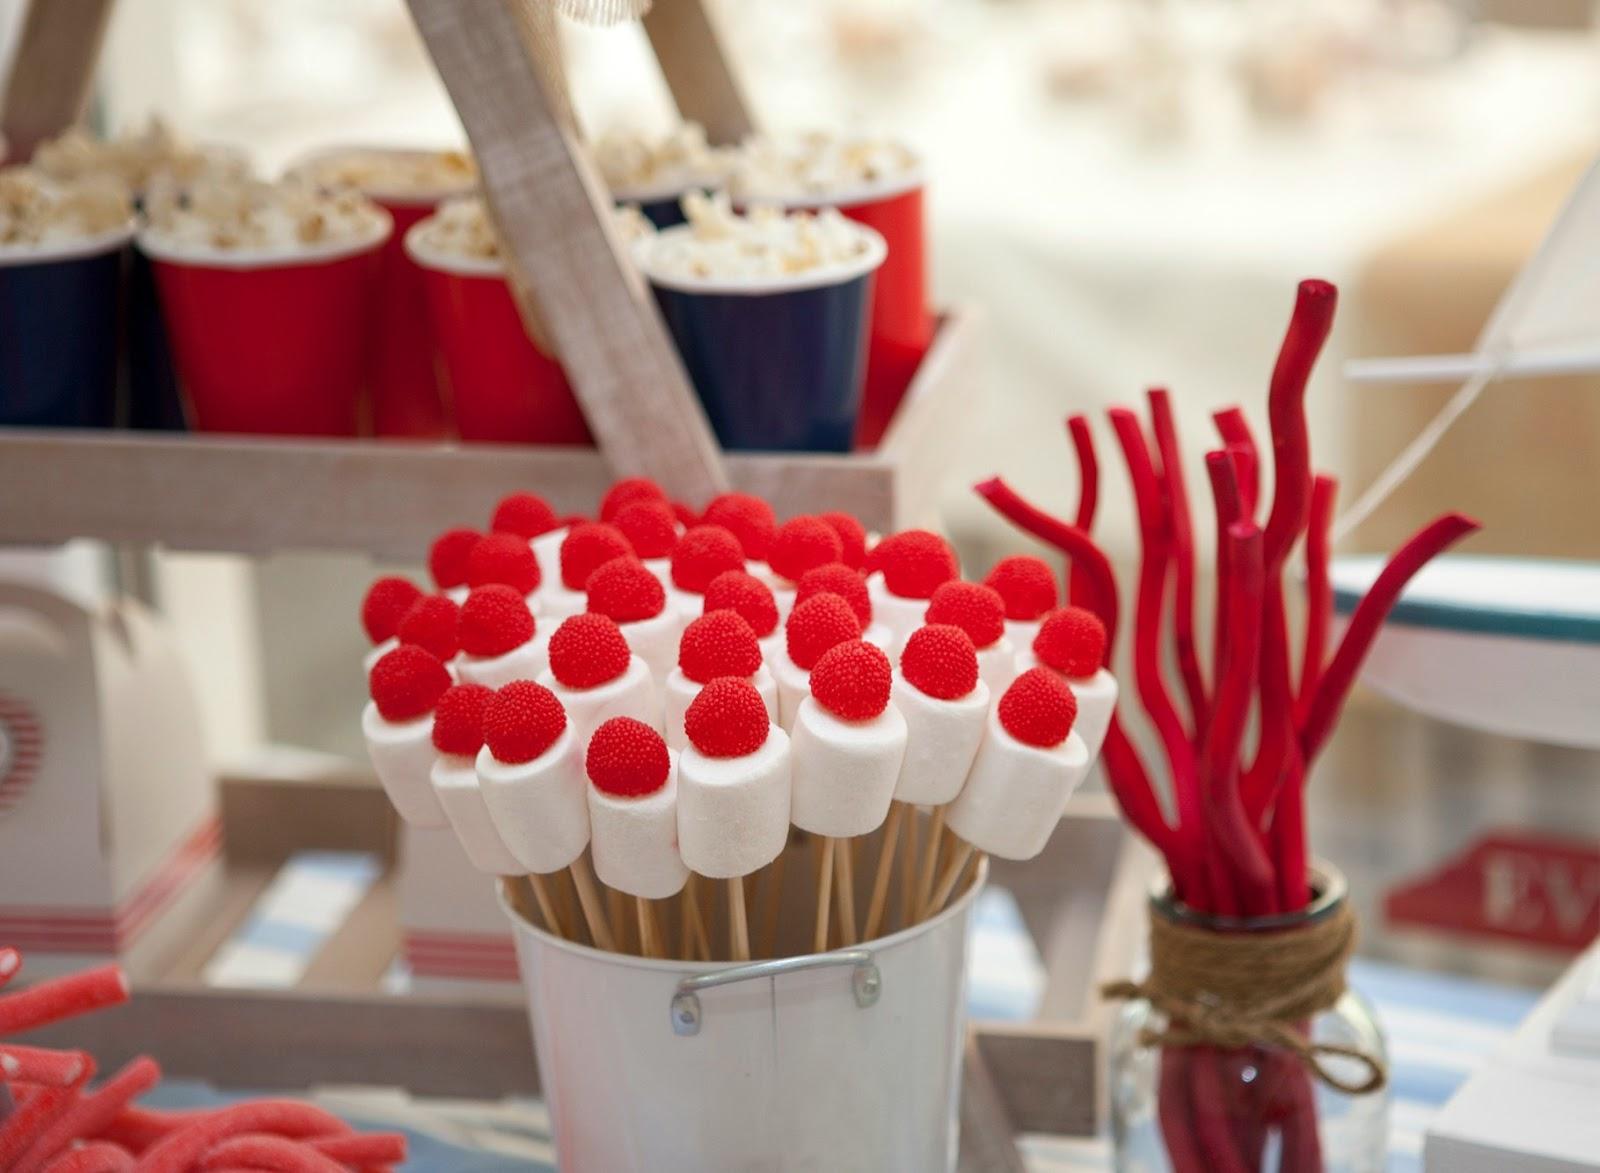 Celebra con ana compartiendo experiencias creativas for Decoracion navidena con chuches